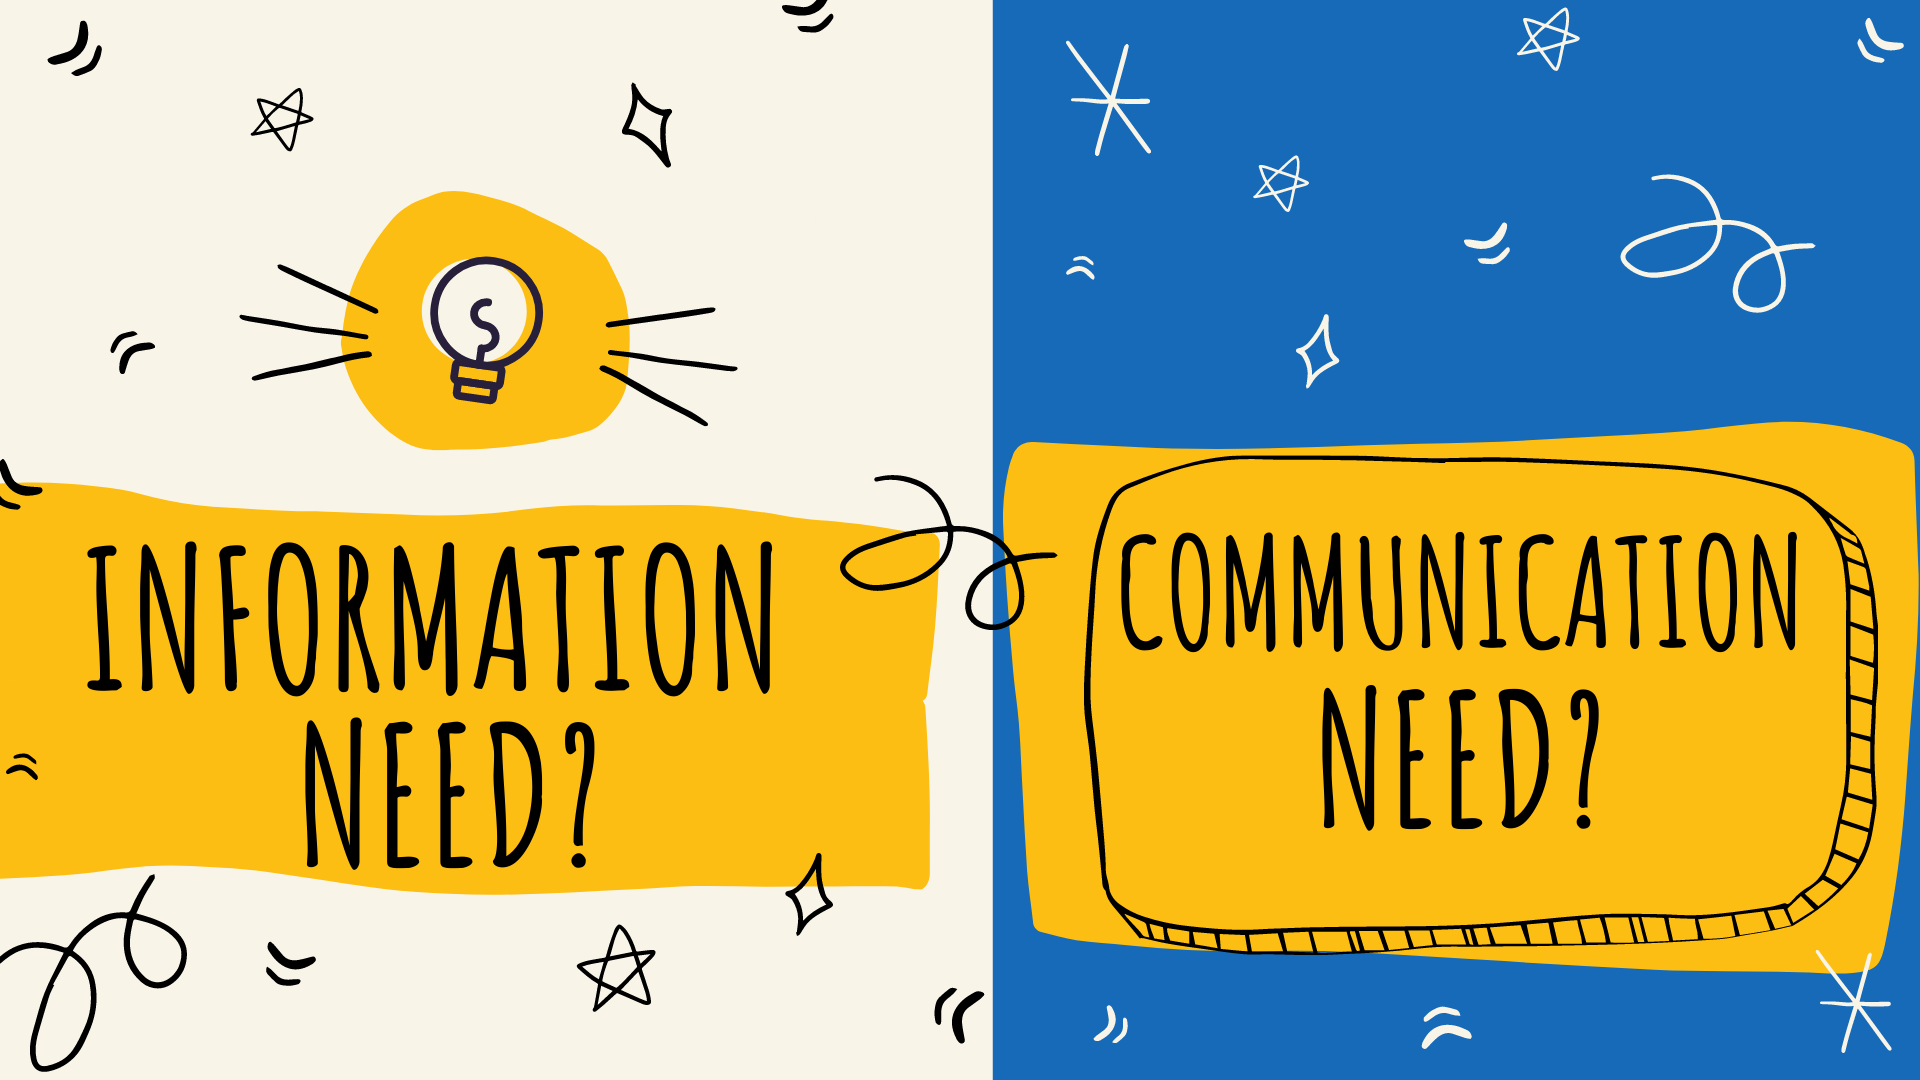 Information & Communication Need?